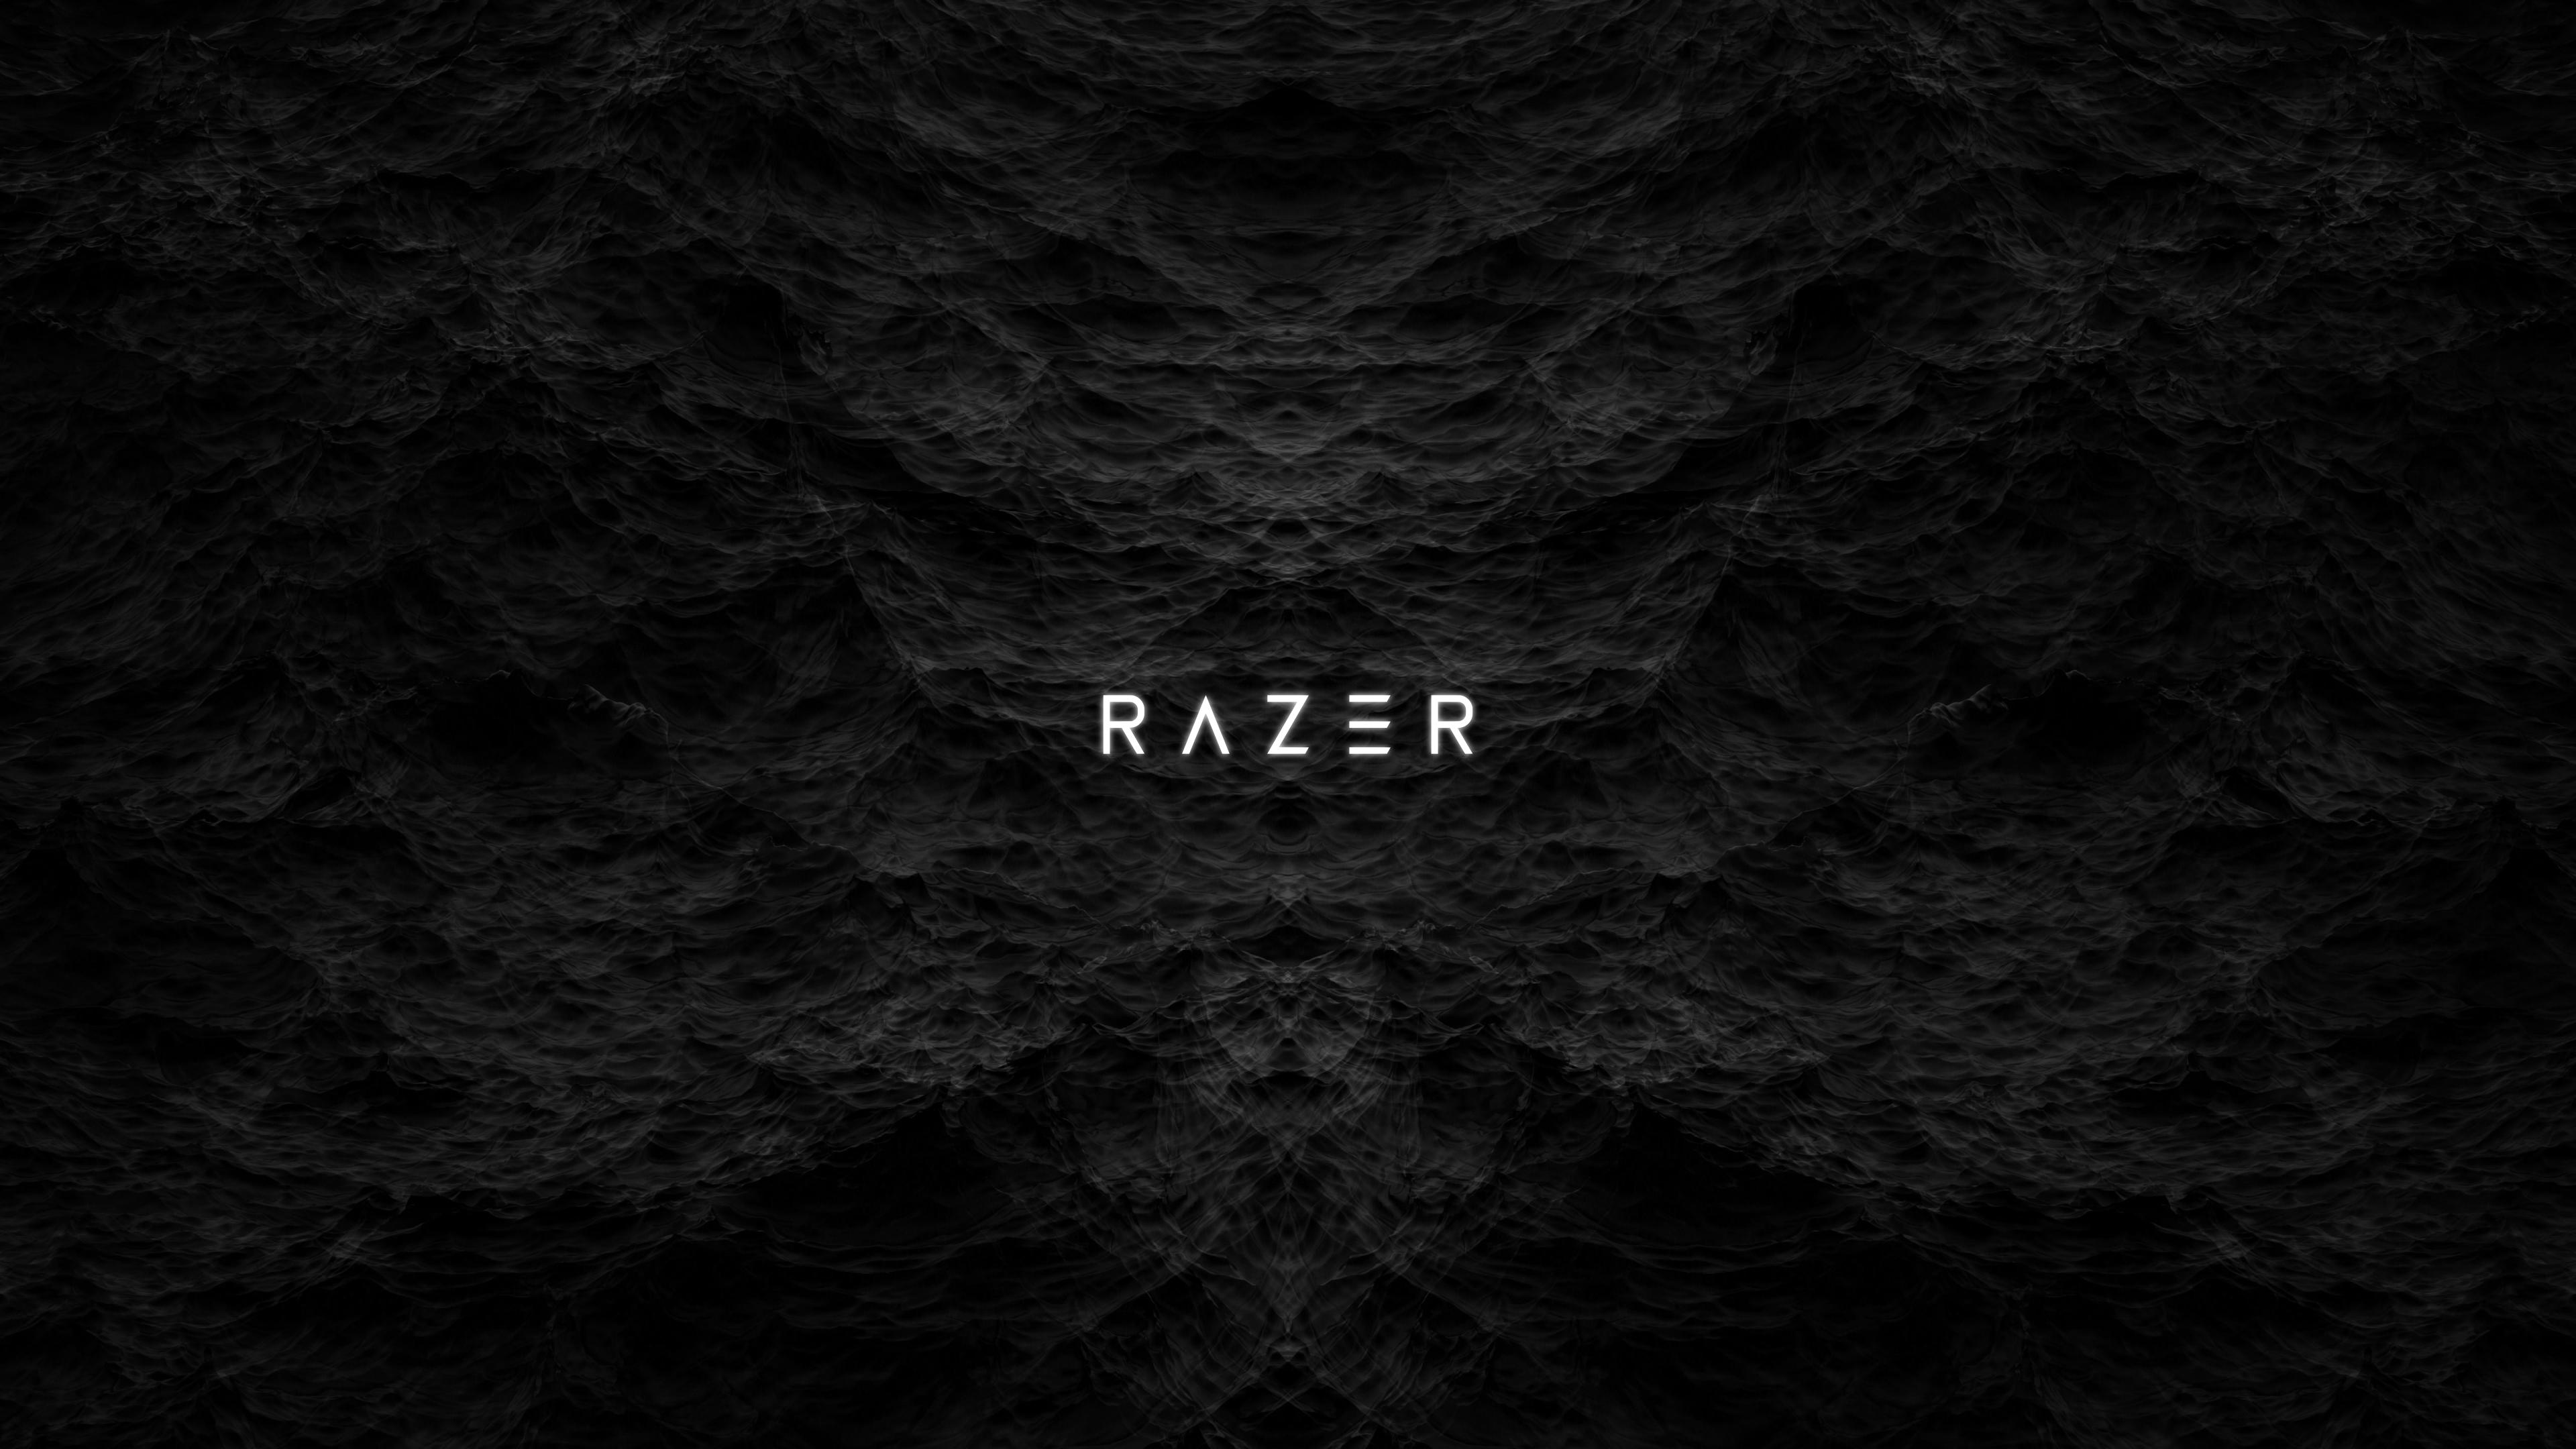 Razer Waves 4k Wallpaper